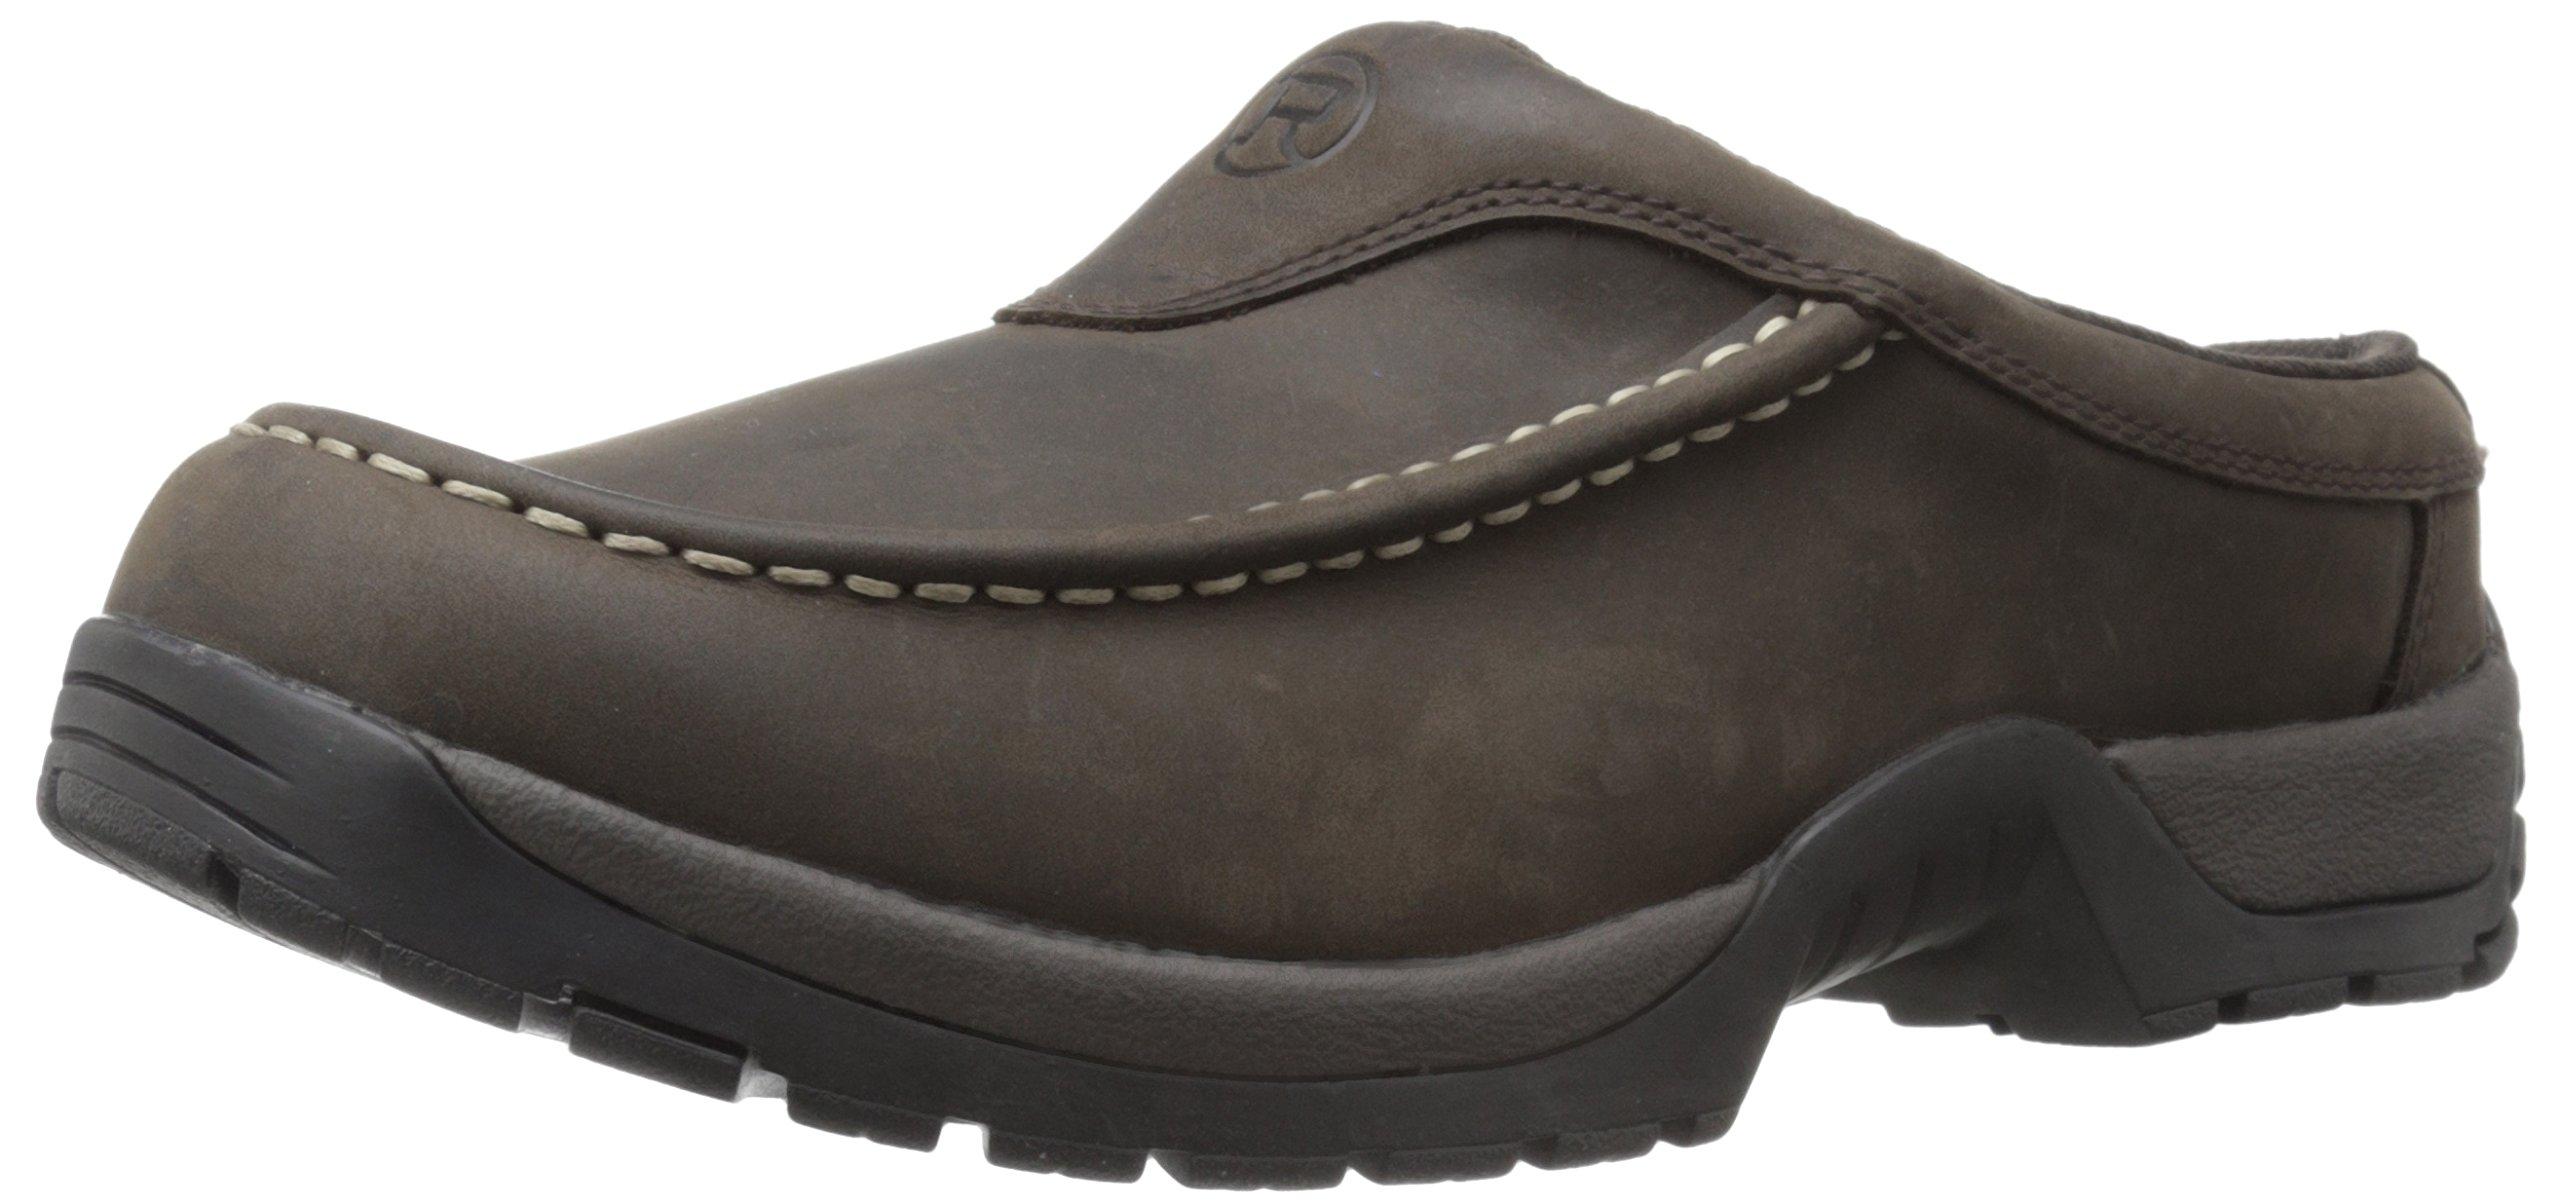 Roper Men's Trot Walking Shoe, Brown, 13 D US